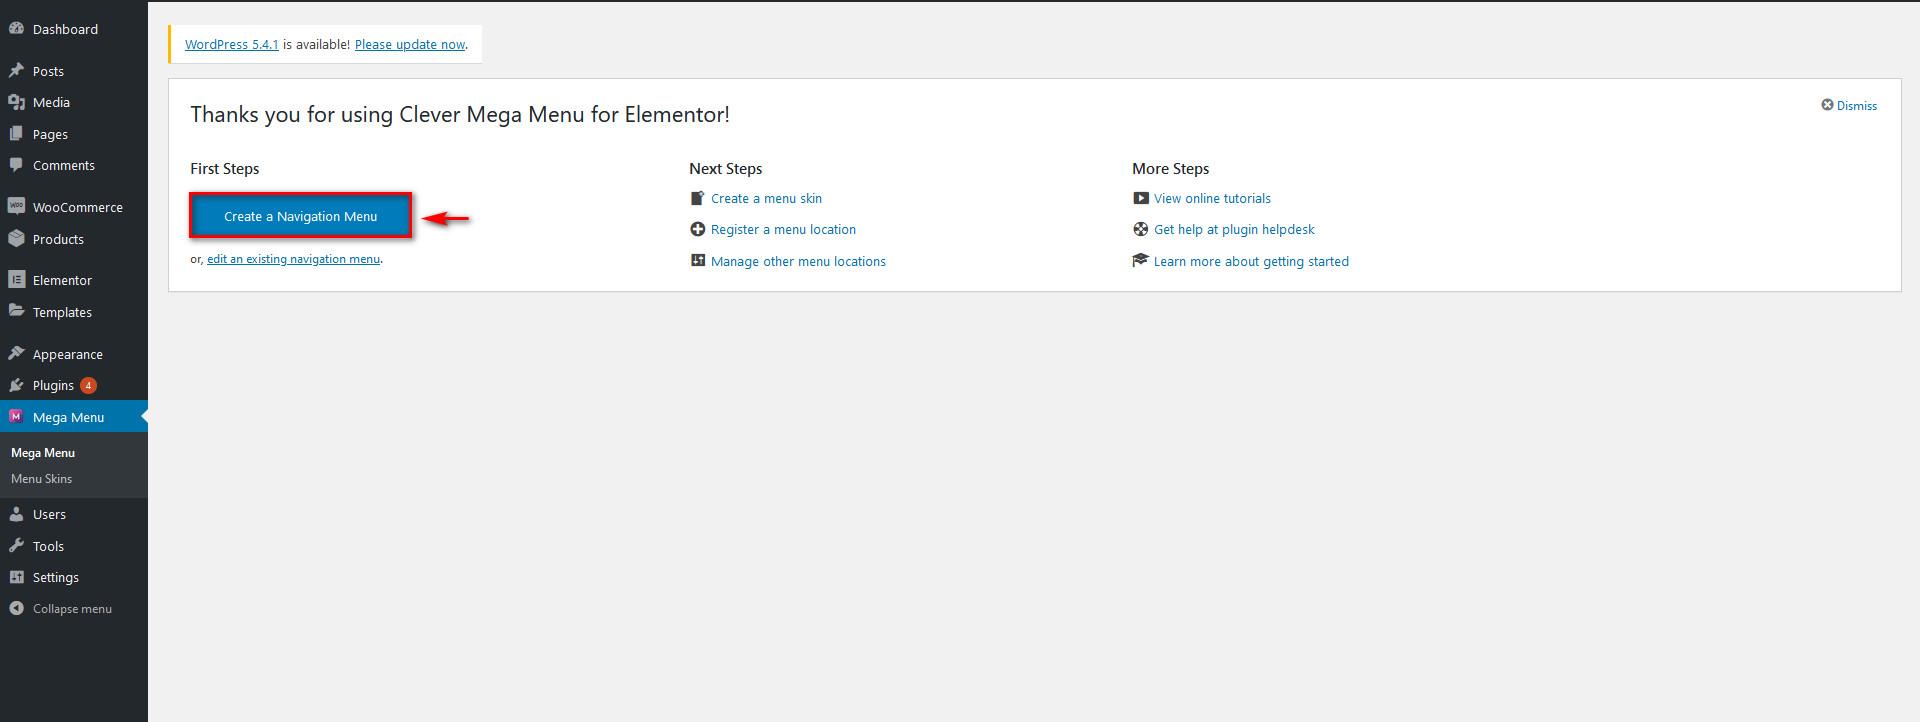 Clever mega menu for elementor - create a navigation menu